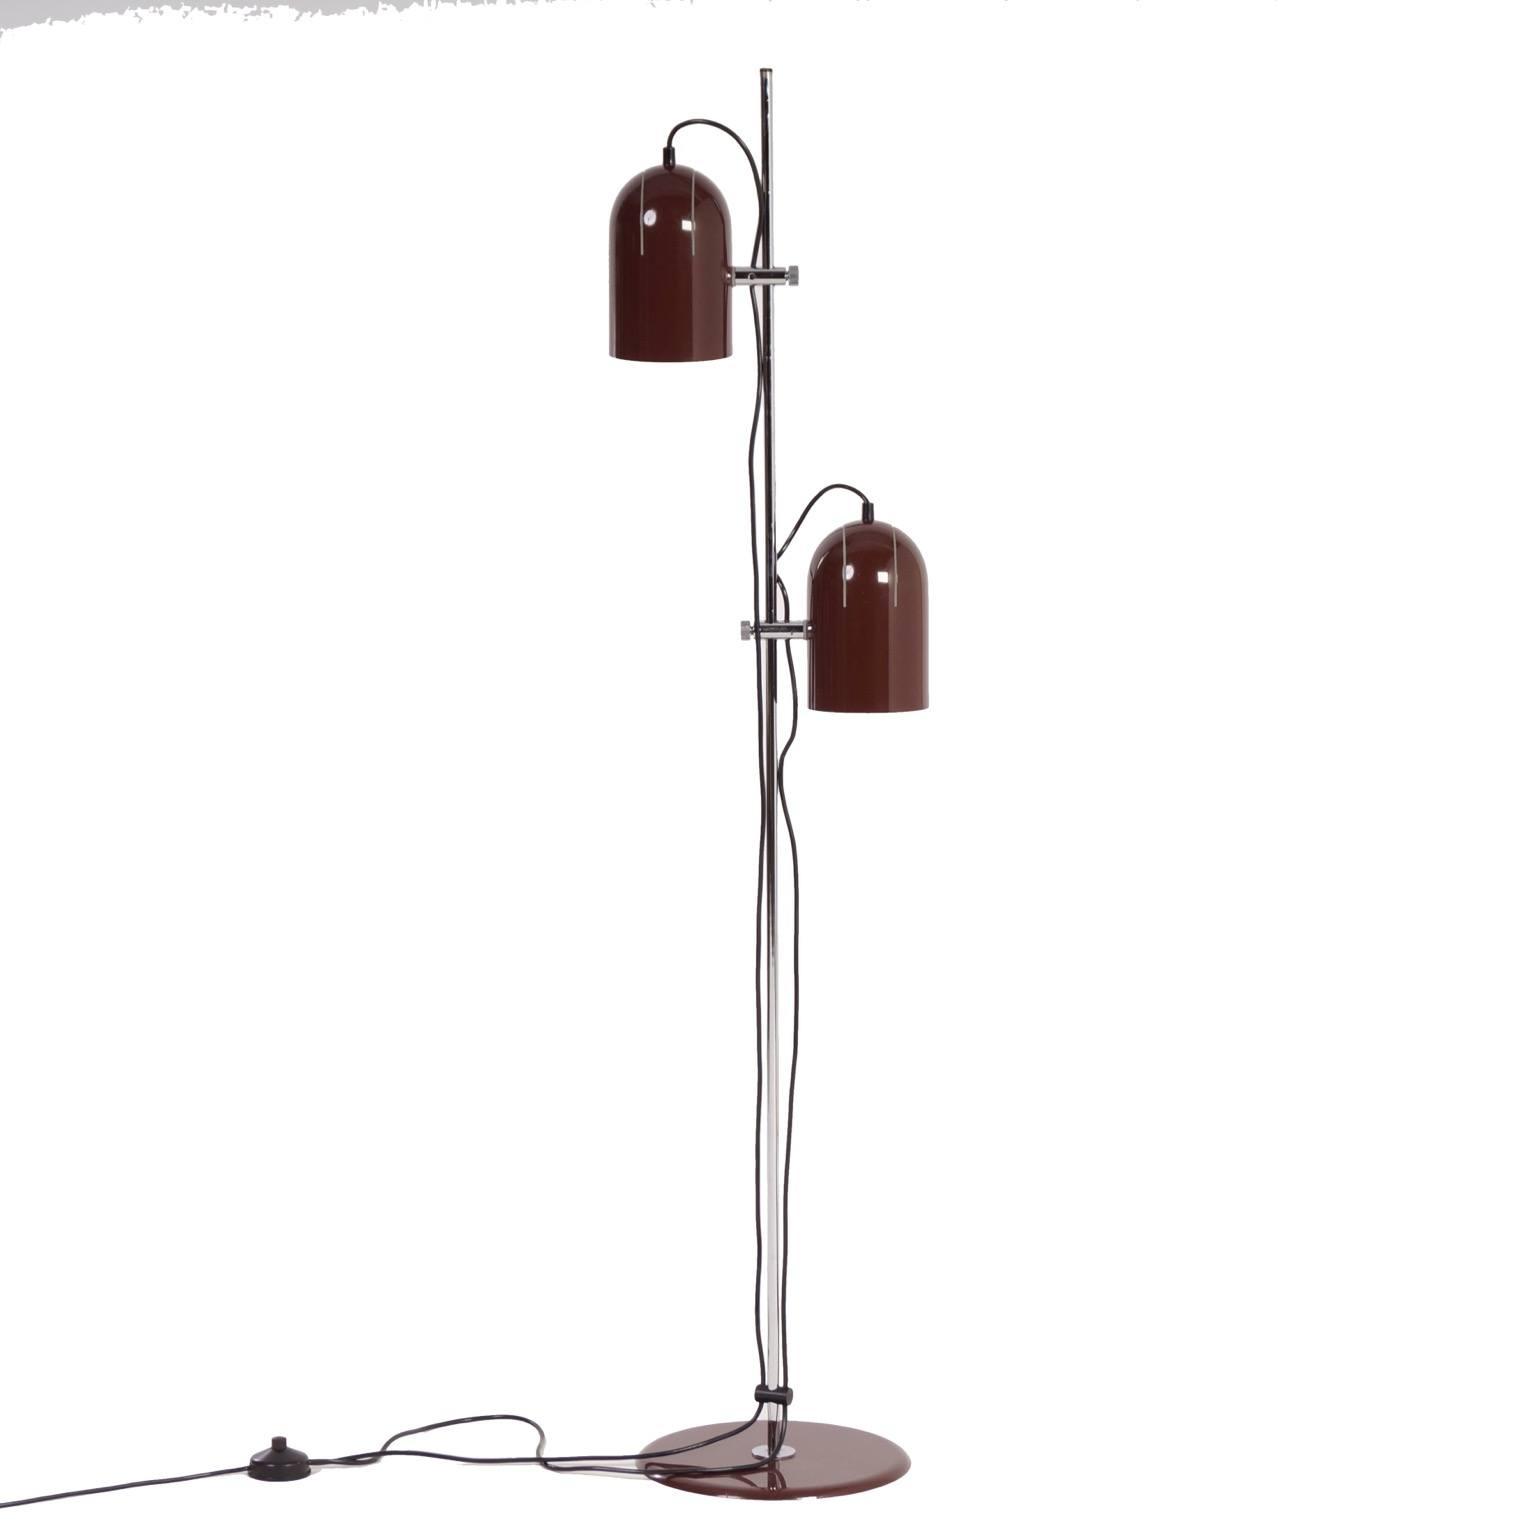 Vintage herda floor lamp 1970s vintage furniture and lamps for 1970s floor lamps